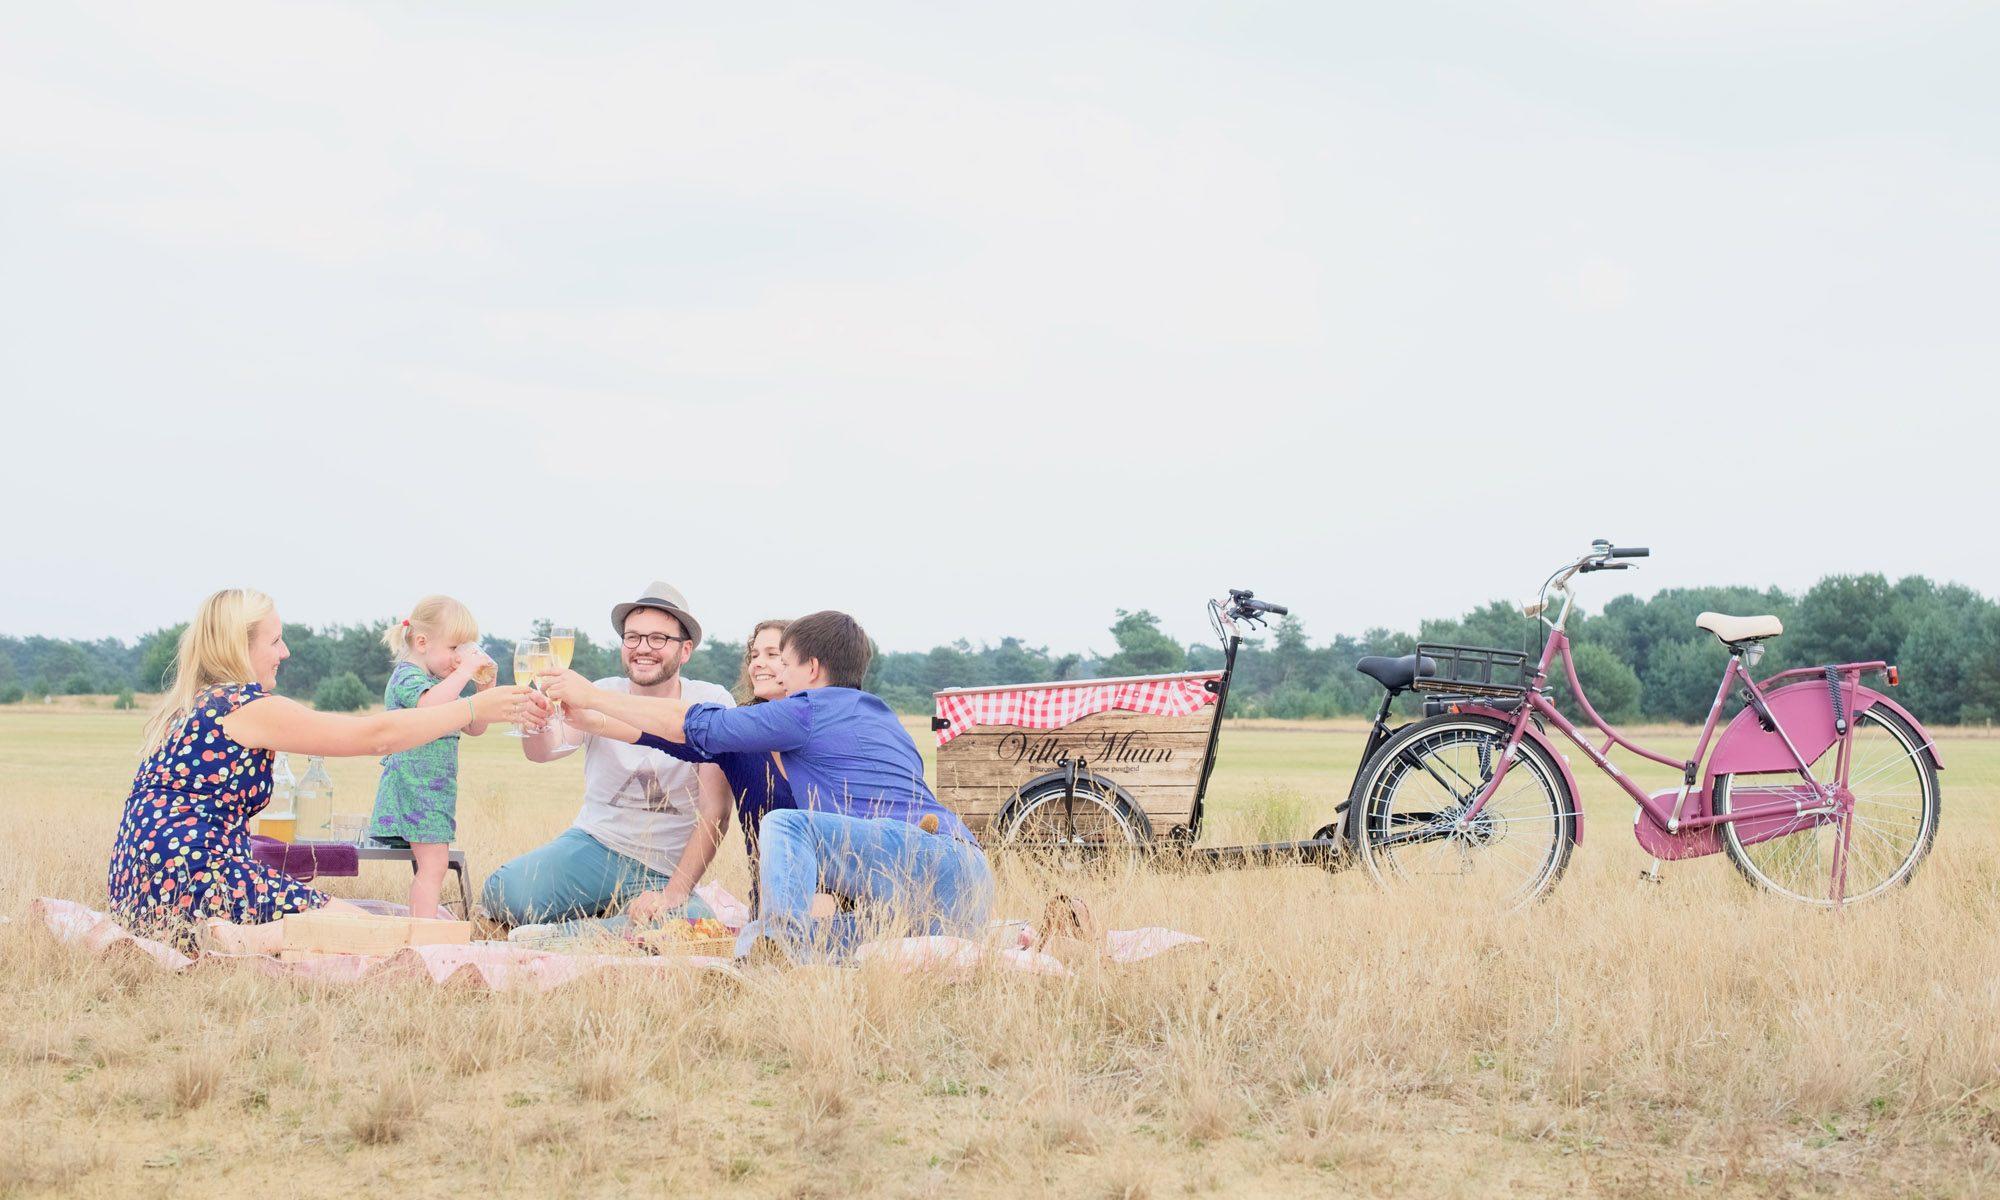 Picknickbakfiets.be